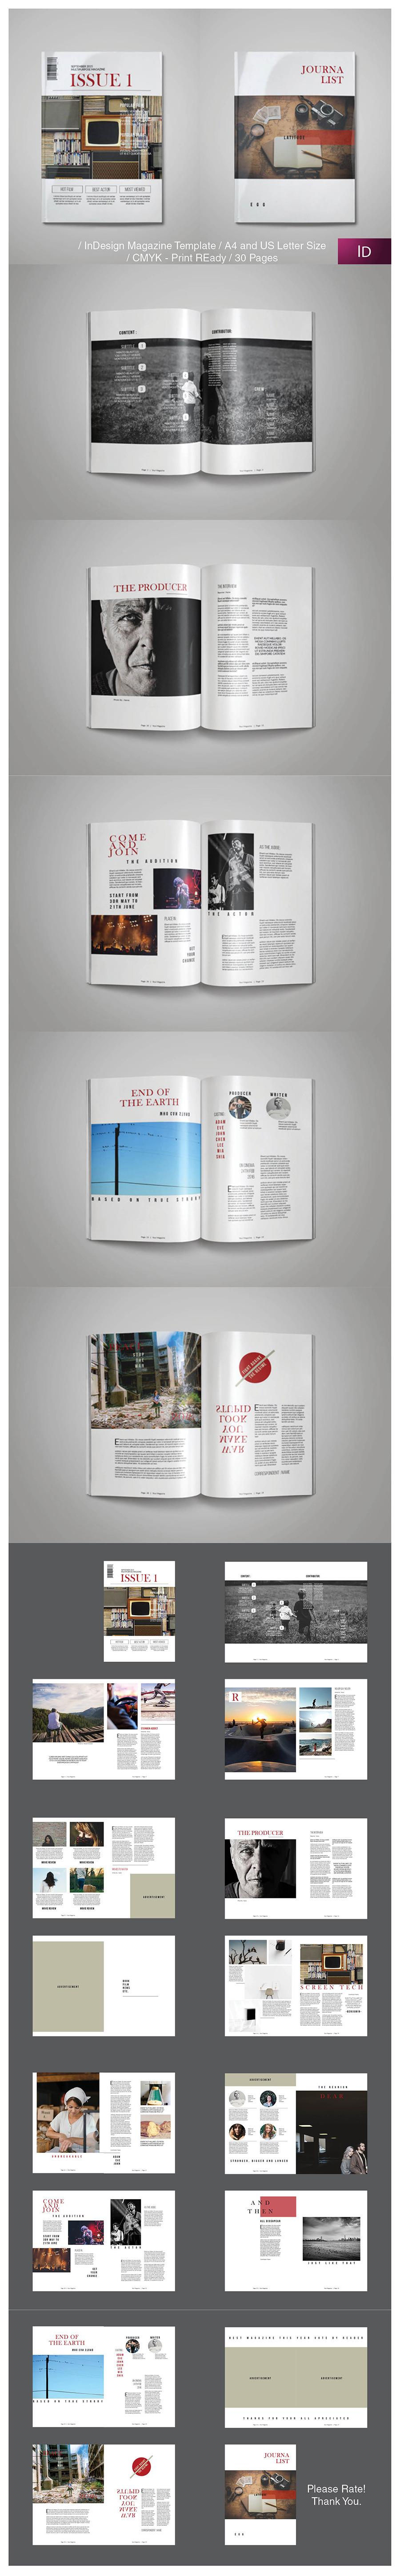 Plantilla Revista Multipropuesta v2 - 1001.graphics